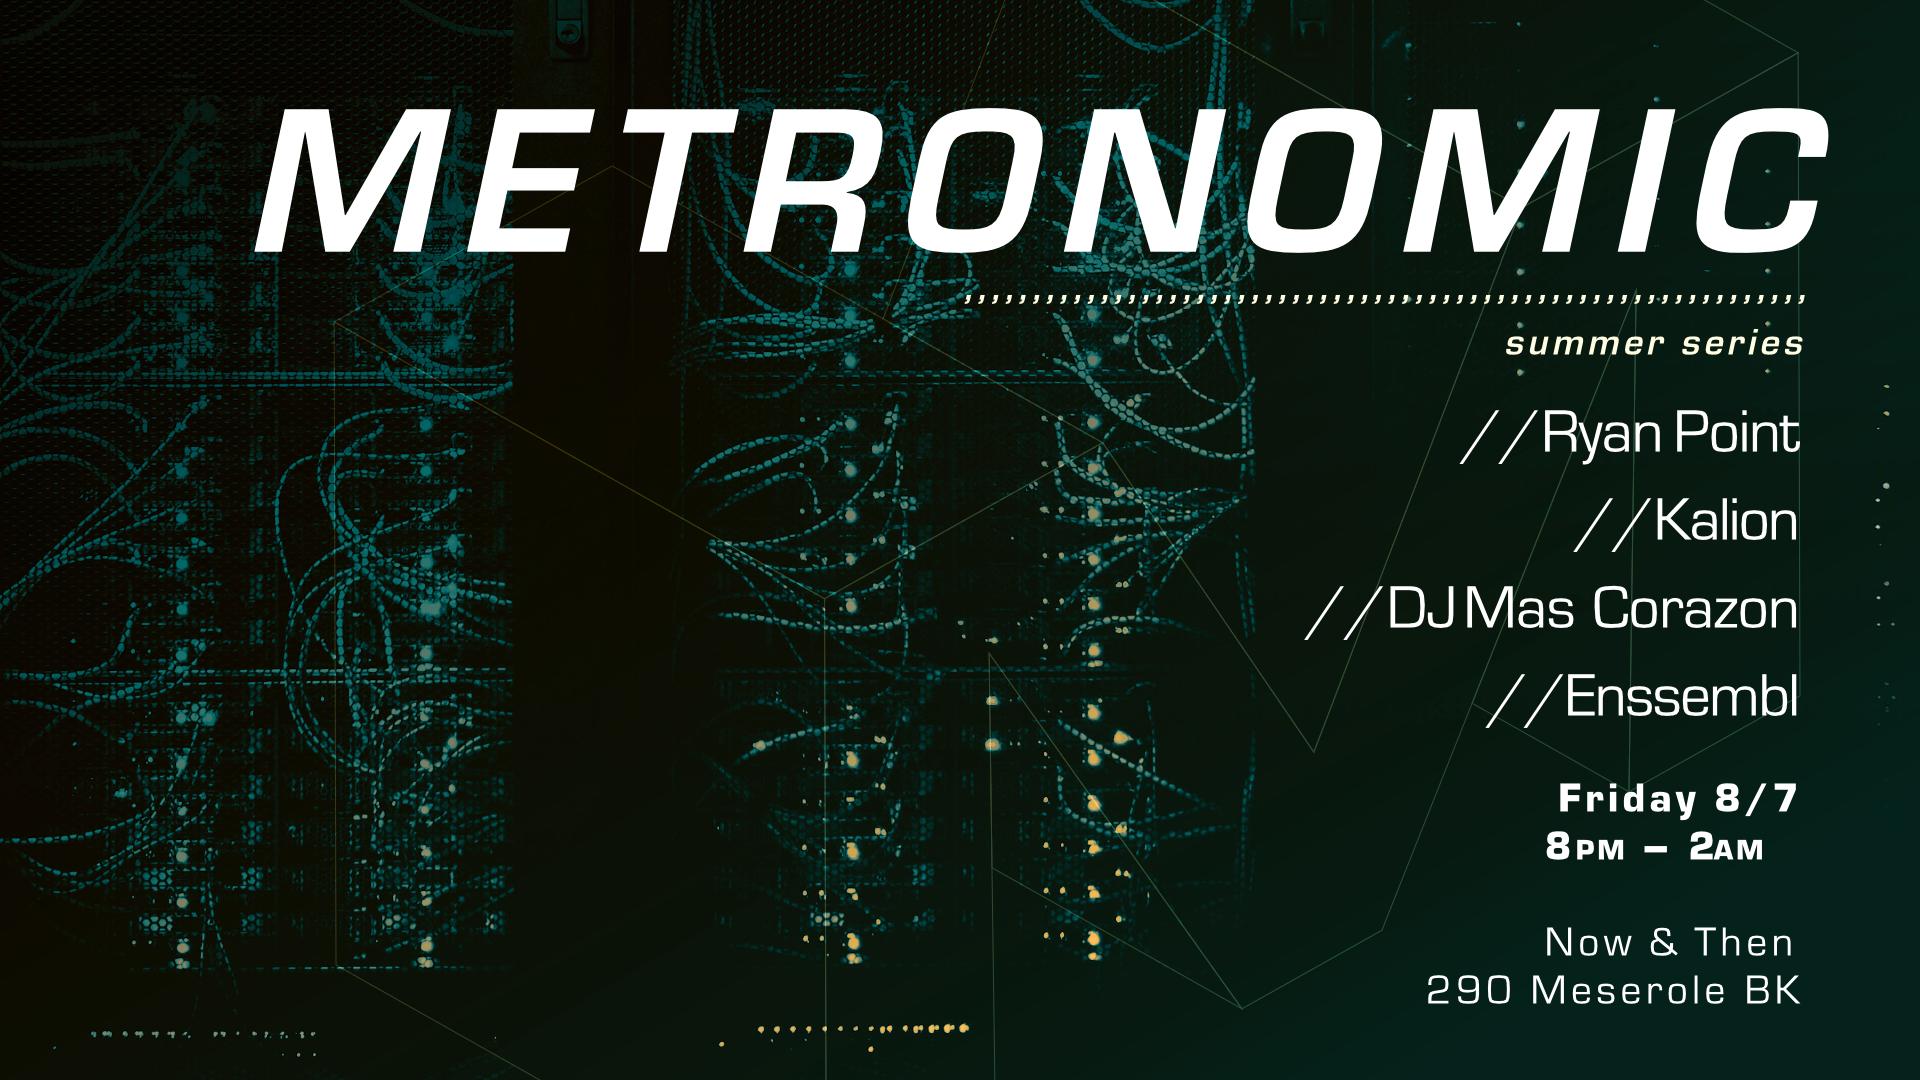 Thumbnail for Metronomic8.7.20 on ViewStub